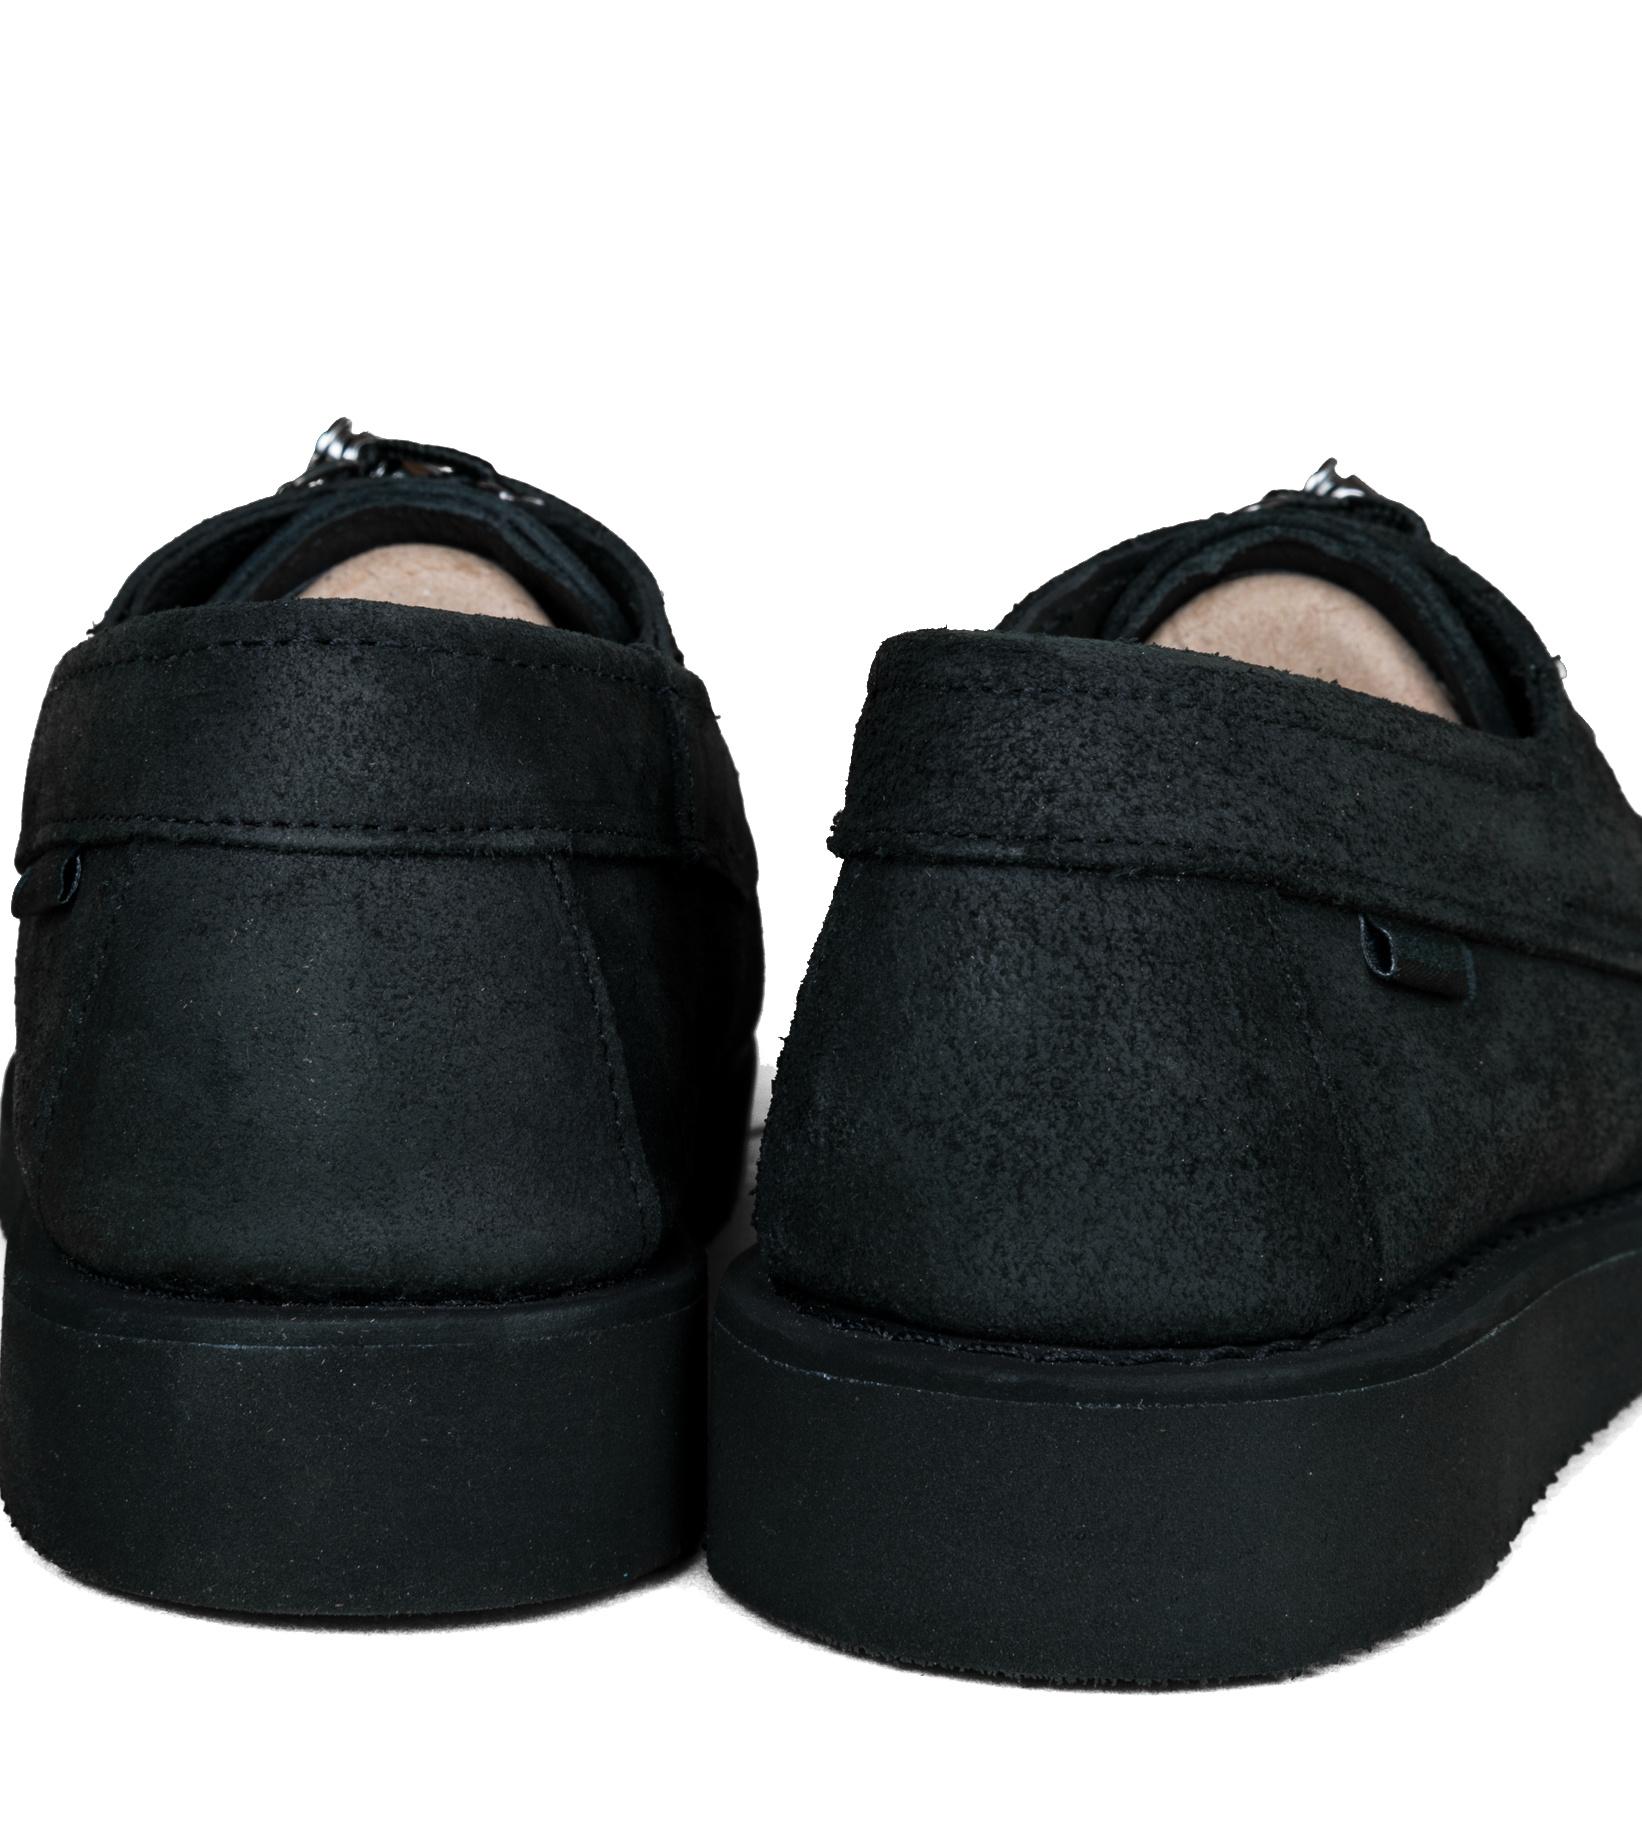 "Overlap x Engineered Garments ""Black""-6"